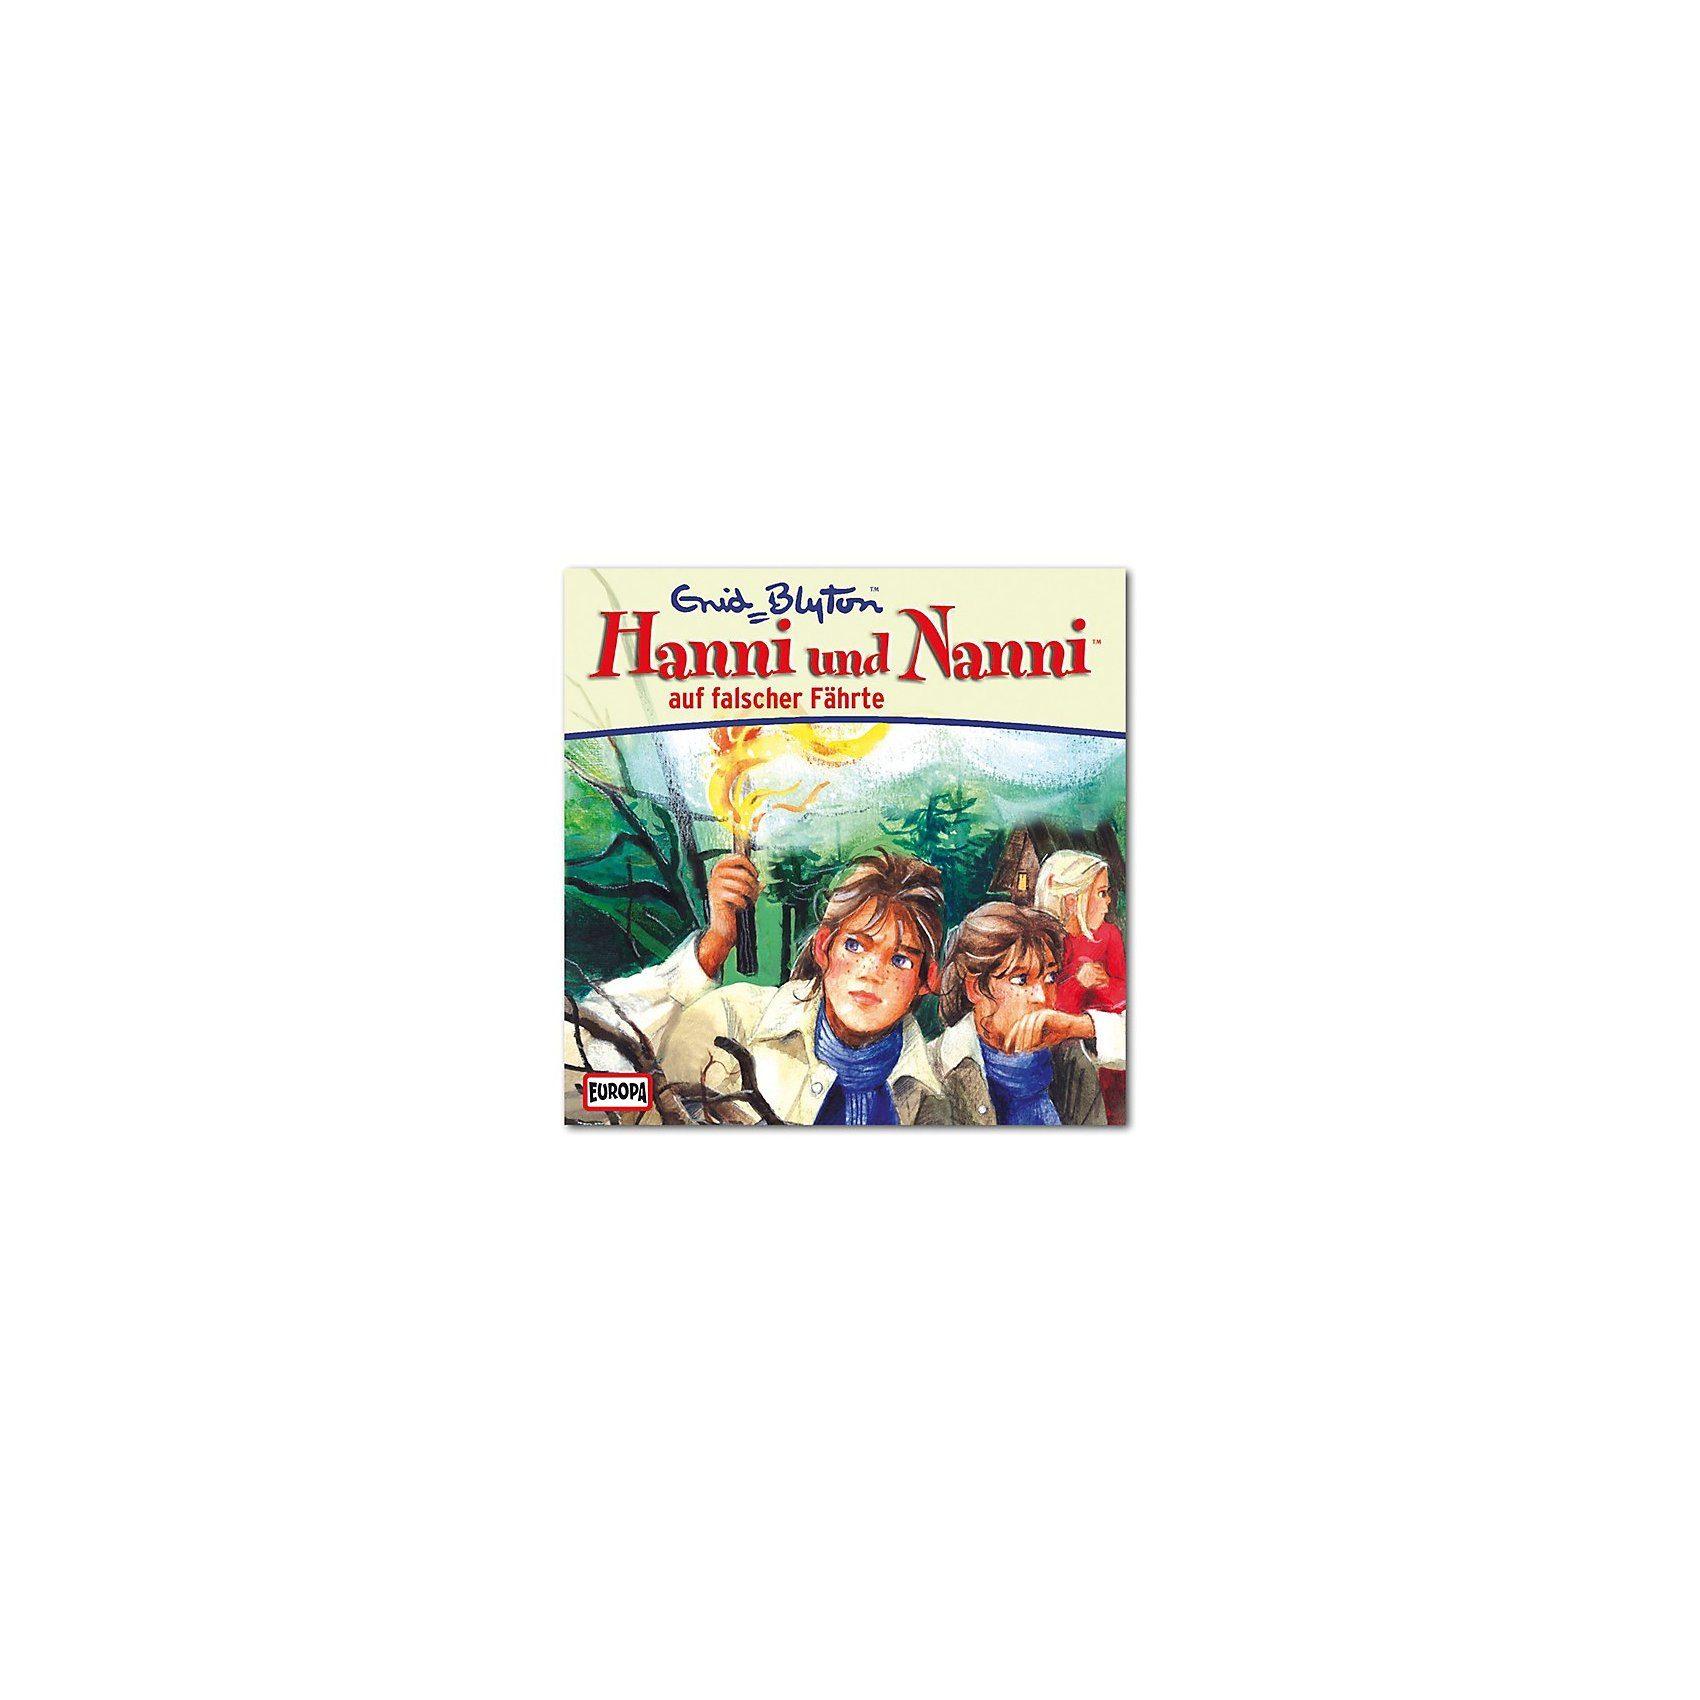 SONY BMG MUSIC CD Hanni & Nanni 25 - auf falscher Fährte